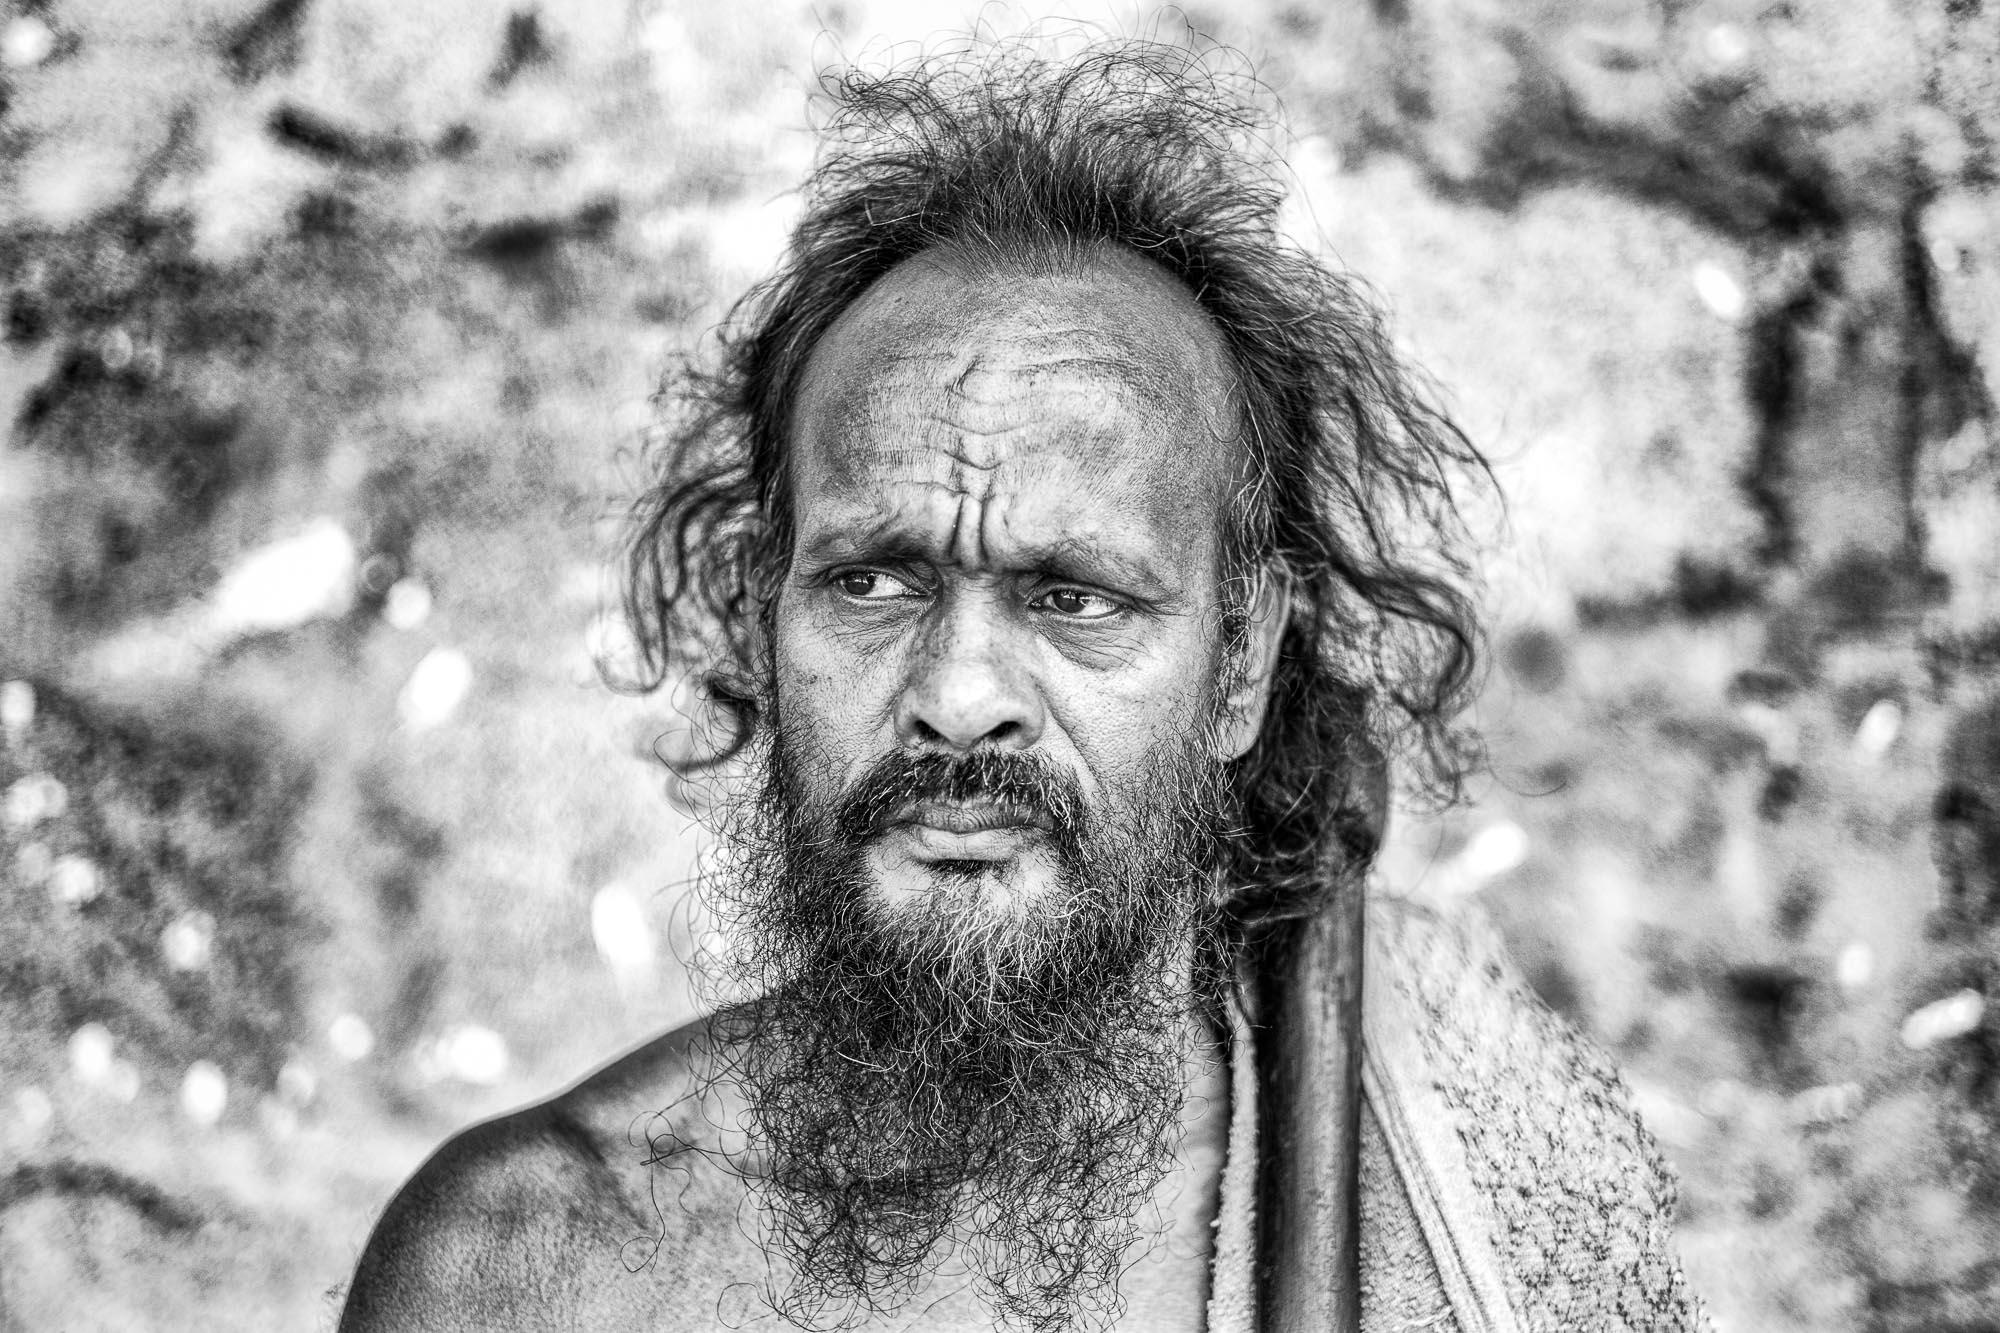 Vadda sri lanka indingenous group people photography - veddas photograph portrait axe shoulder